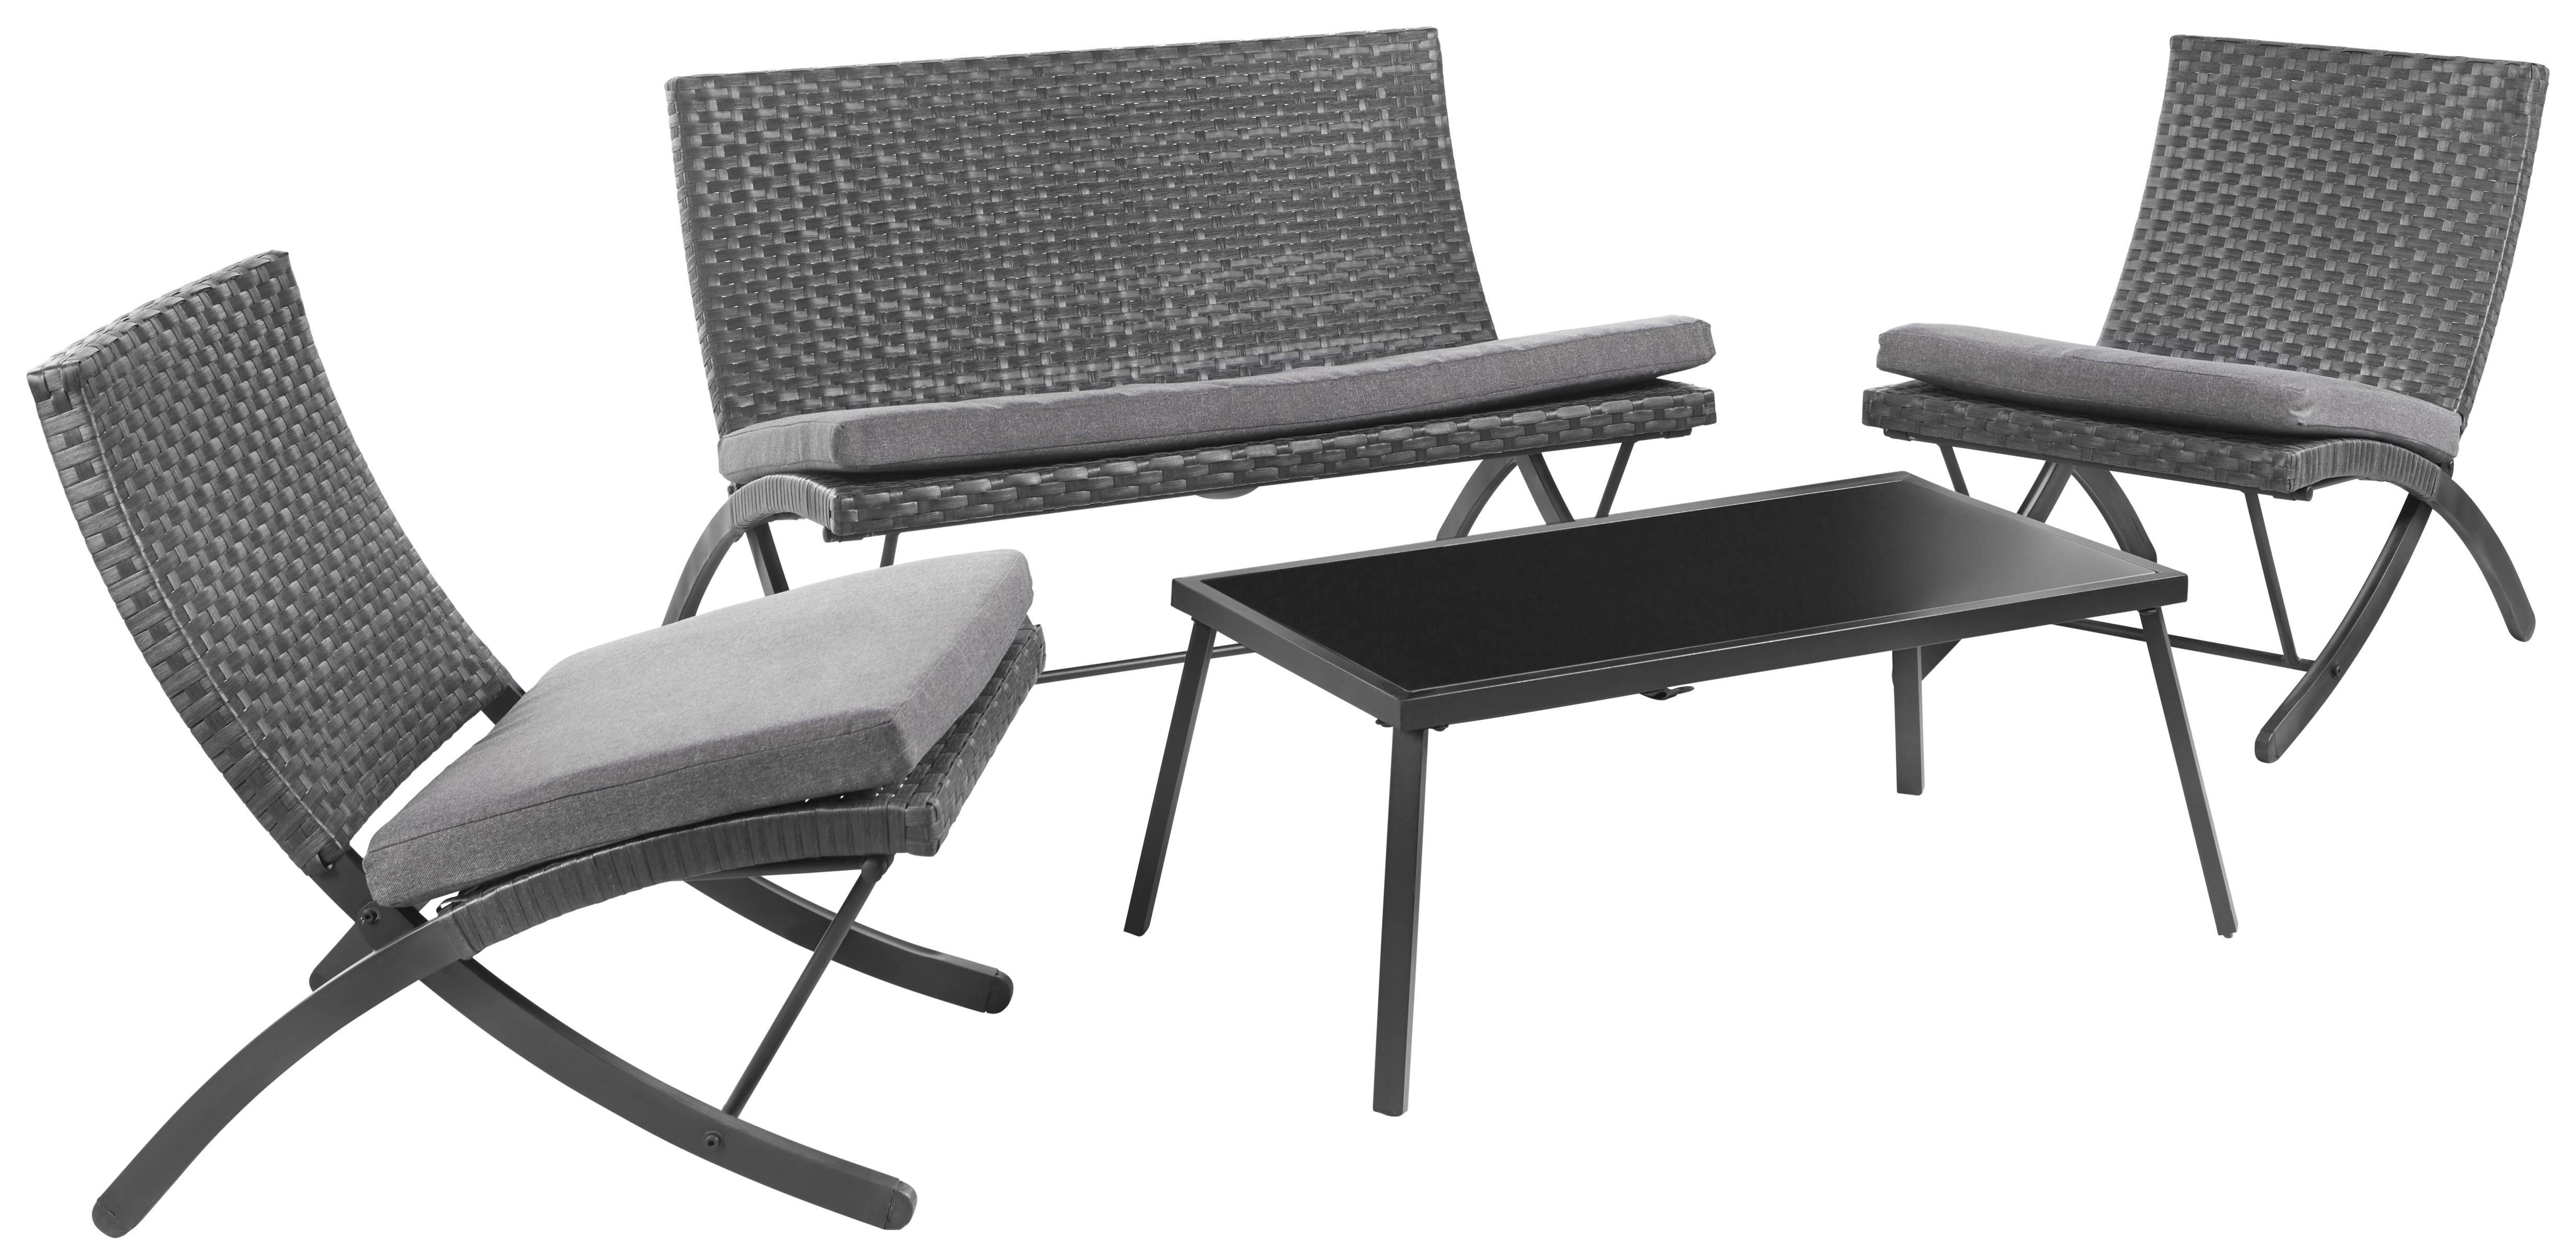 gartenmobel metall preiswert dekoration wohndesign. Black Bedroom Furniture Sets. Home Design Ideas